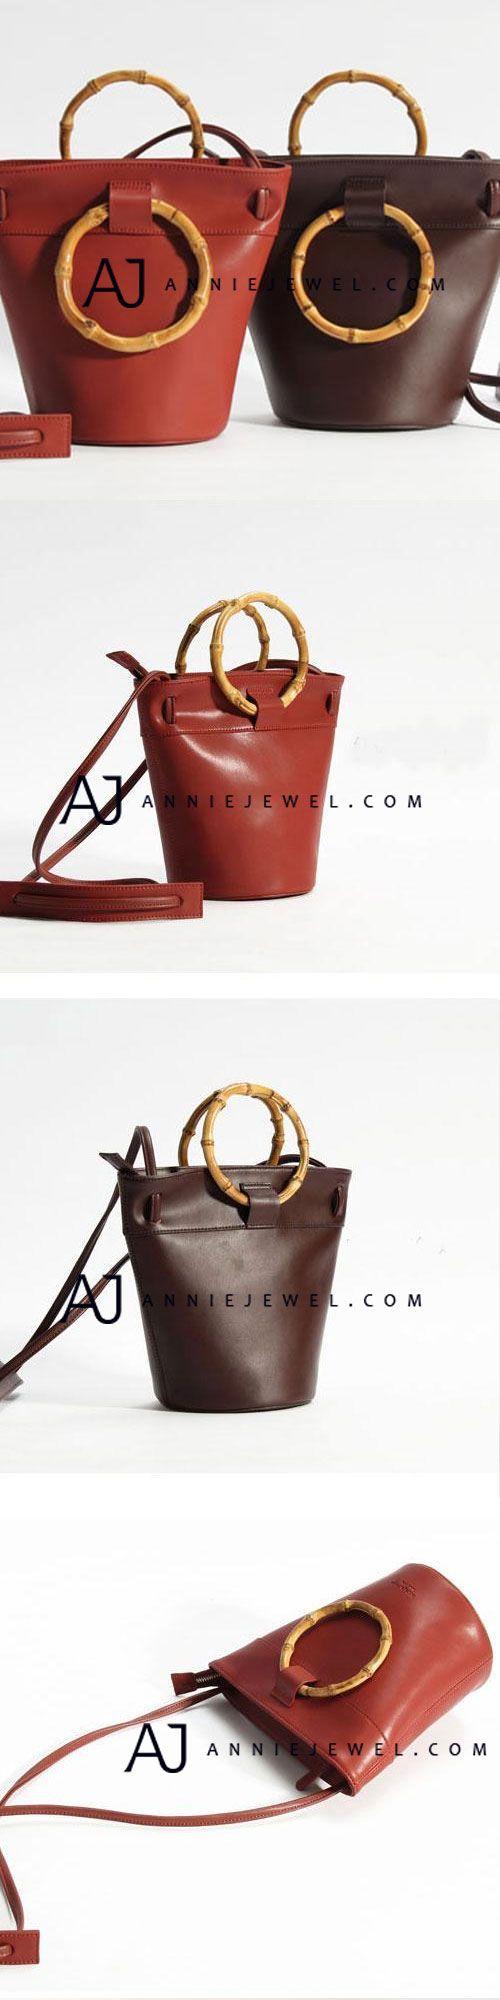 GENUINE LEATHER HANDMADE HANDBAG BAMBOO CROSSBODY BAG SHOULDER BAG PURSE CLUTCH FOR WOMEN